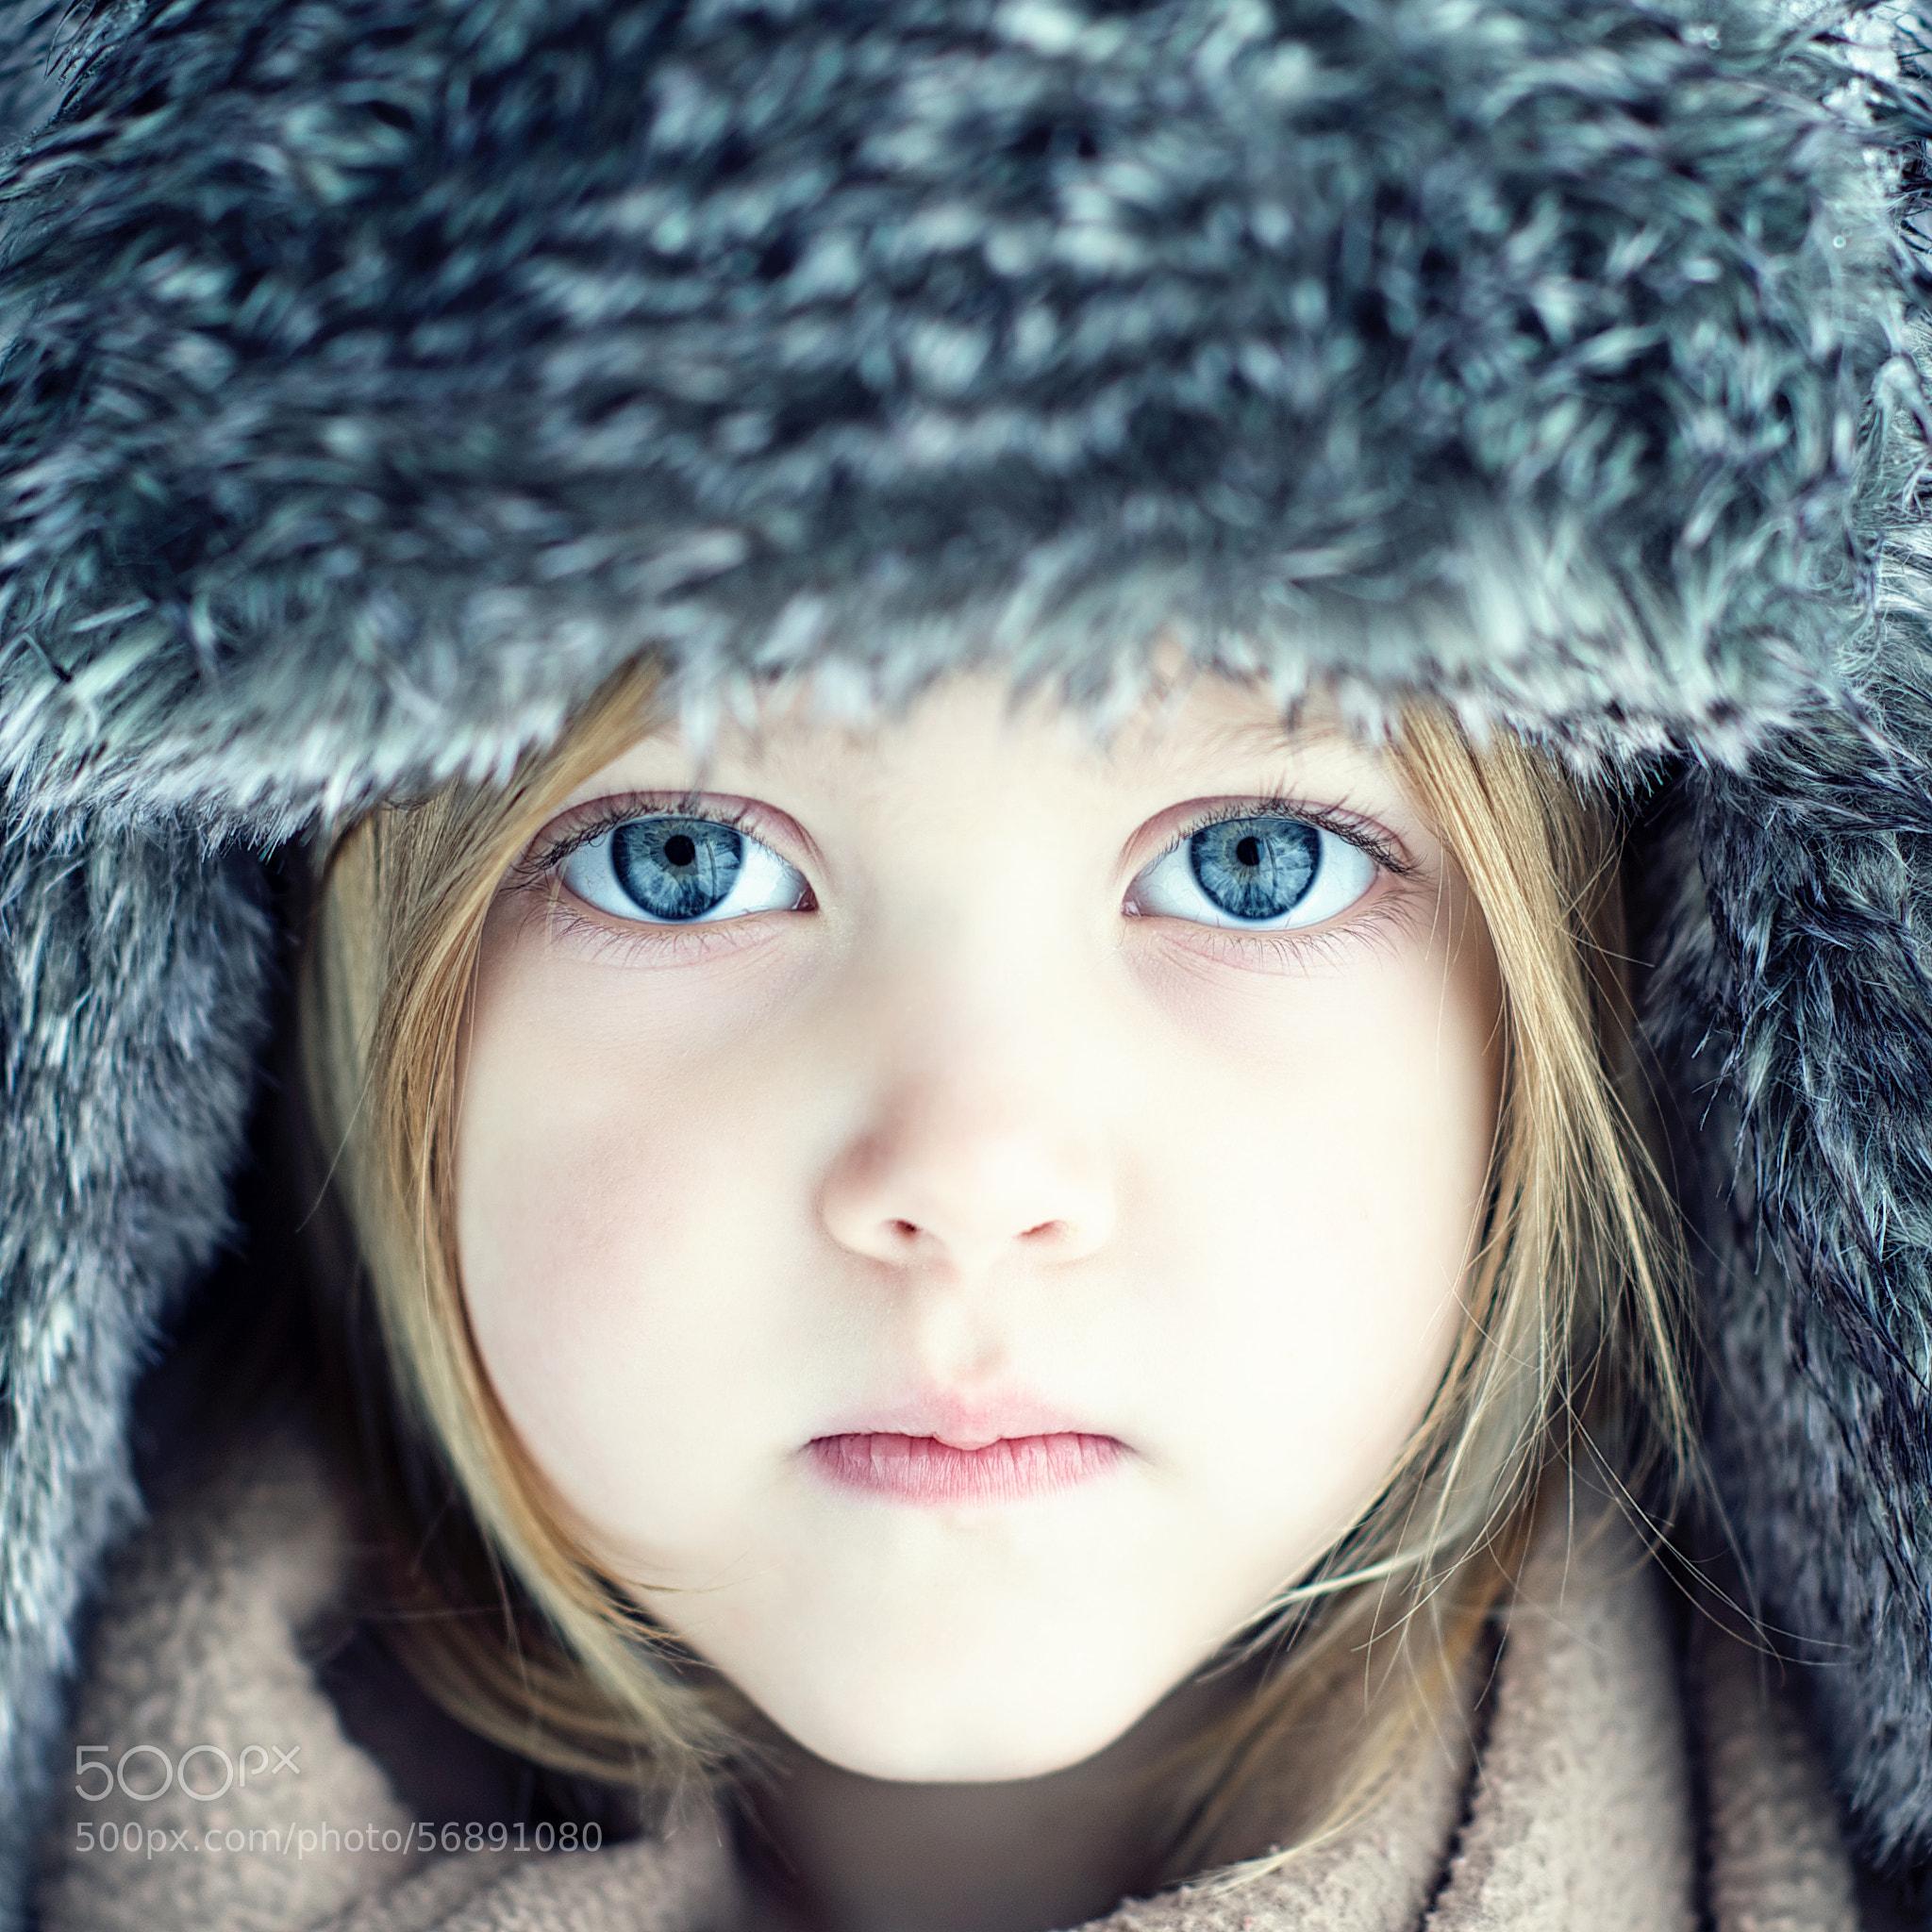 Photograph Frozen by Ryan Pendleton on 500px